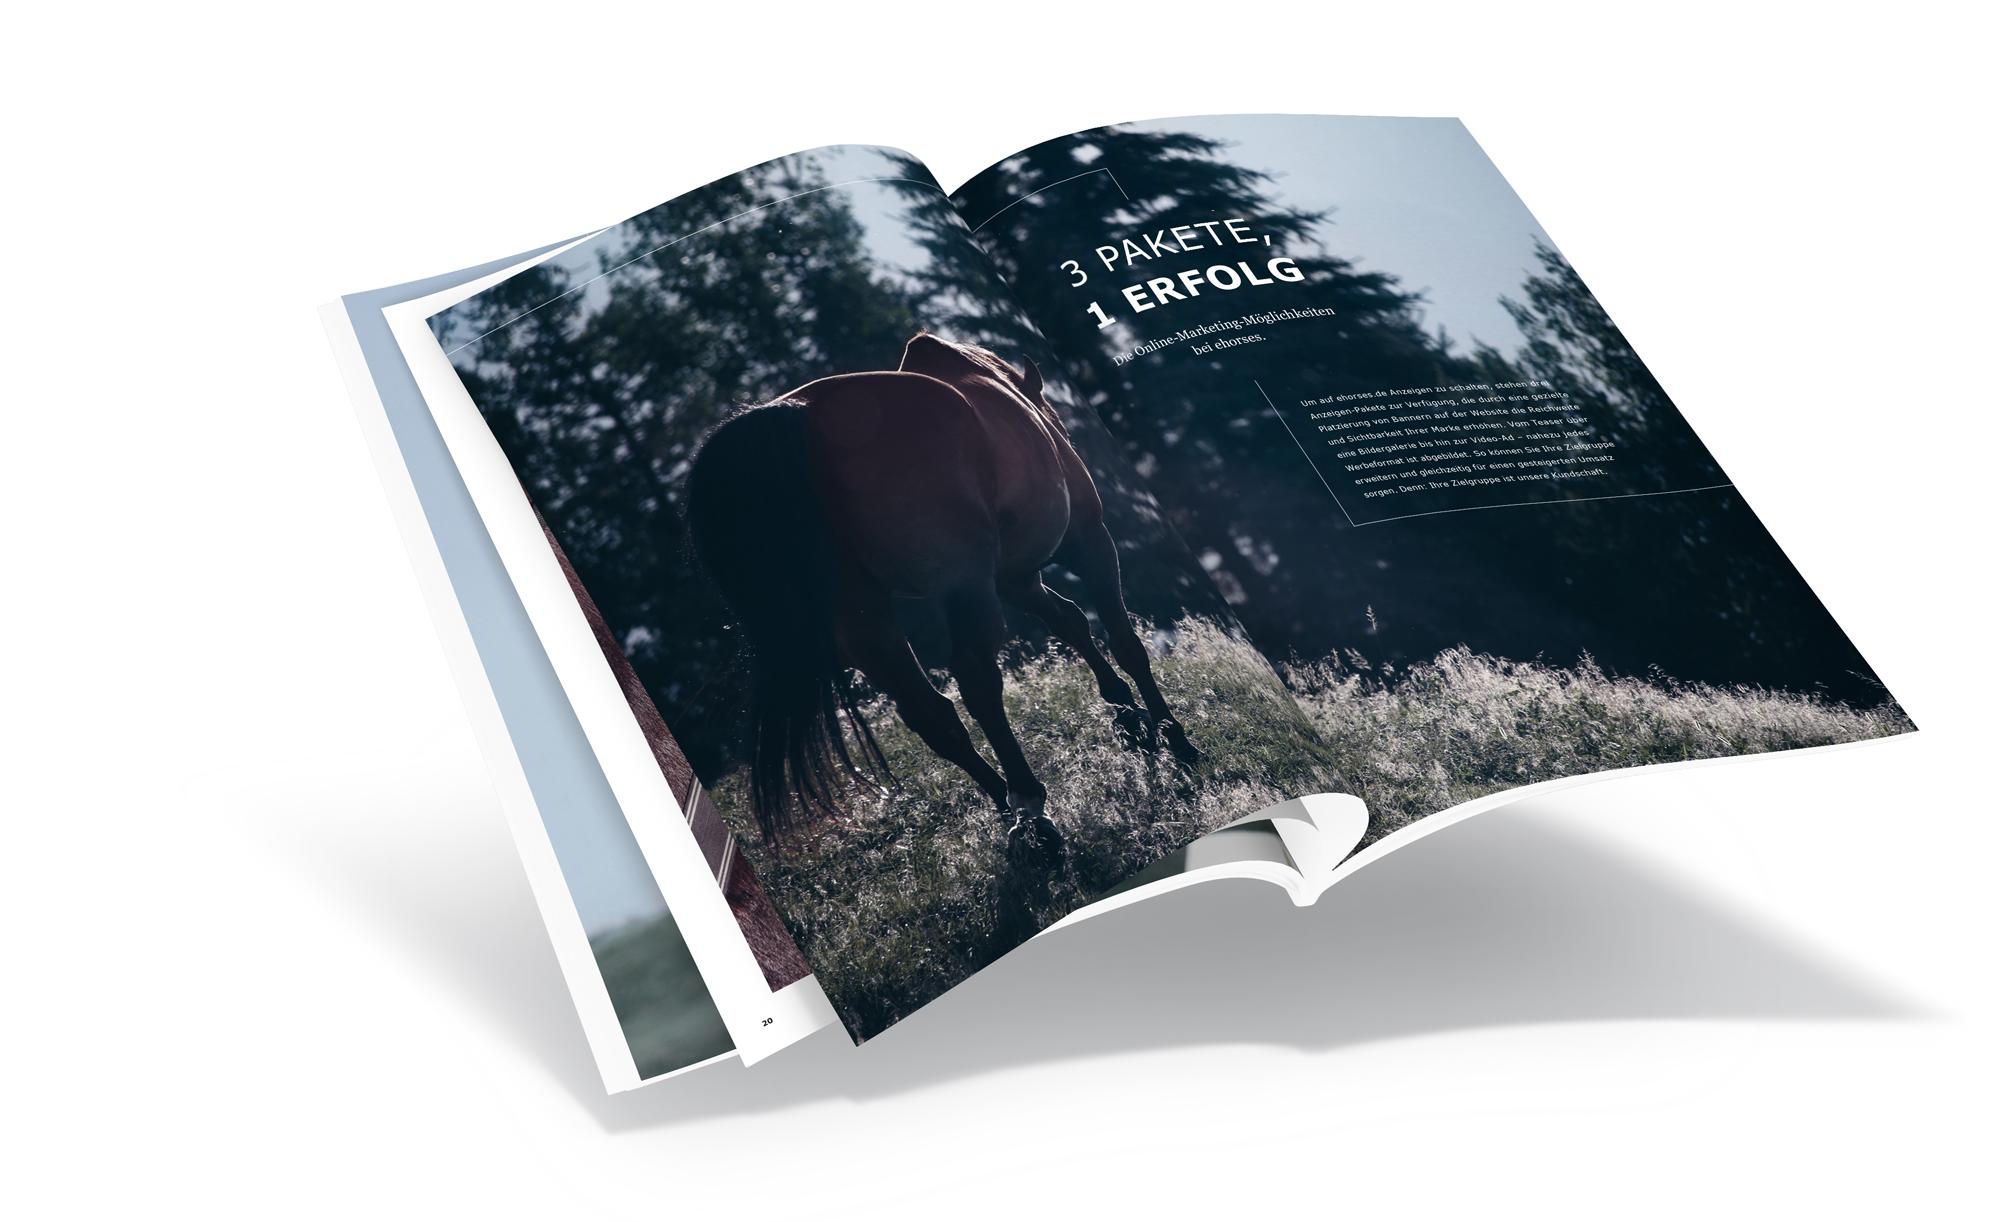 Wiethe » Filters » Design Digital